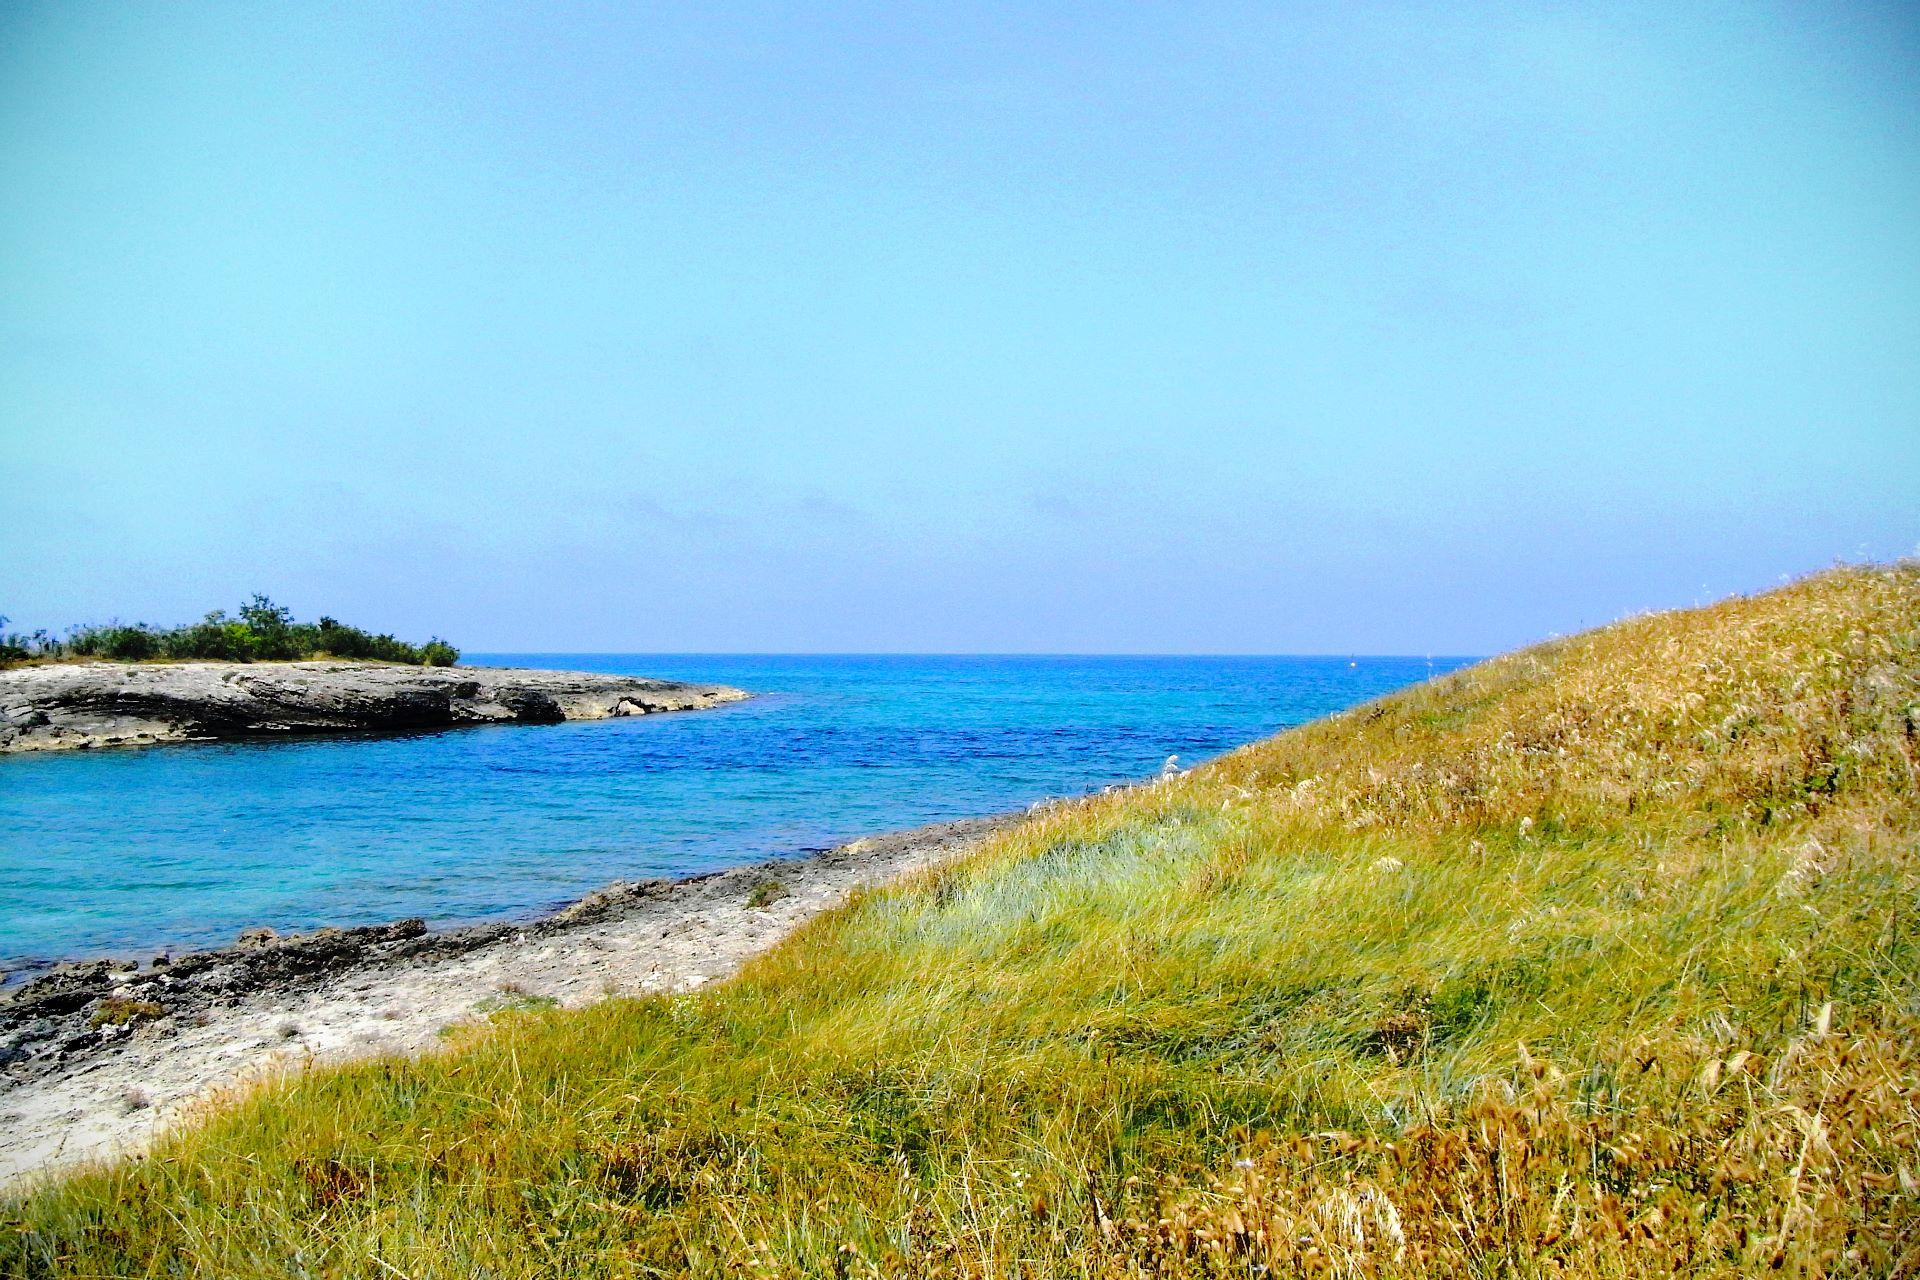 apulia-slow-travel-torre-guaceto-natural-reserve-hiking-naturschutzgebiet-adriatic-sea-meer-adriatico-mare-puglia-apulien wanderung-gita-walking adria